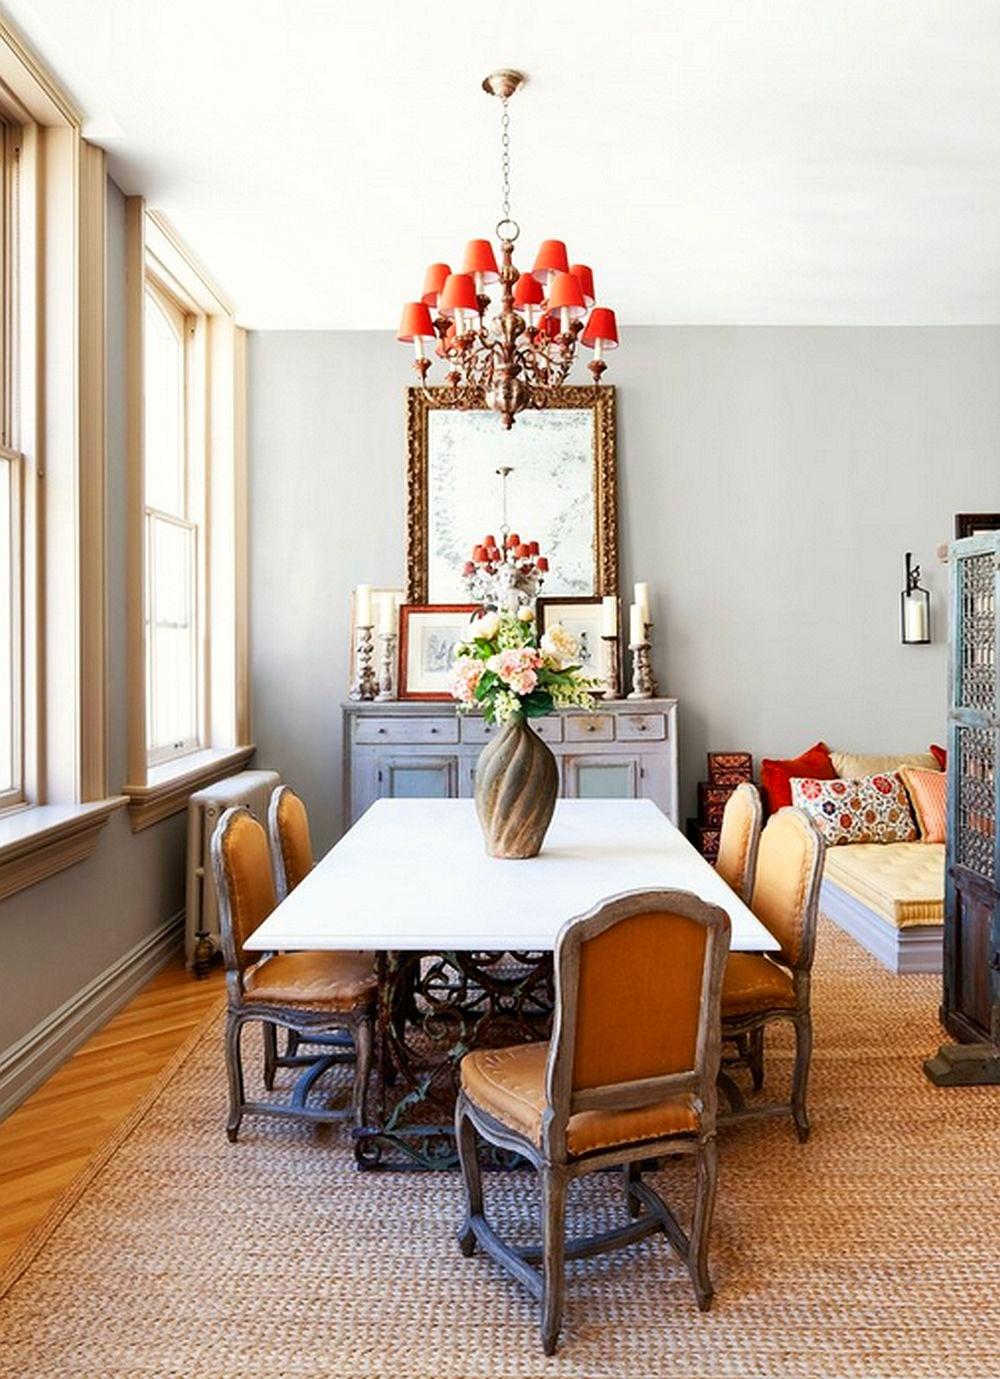 adelaparvu.com despre loft in stil eclectic cu influente marocane, morrocan style, designer Deborah French, Foto Yiorgos Kordakis (6)